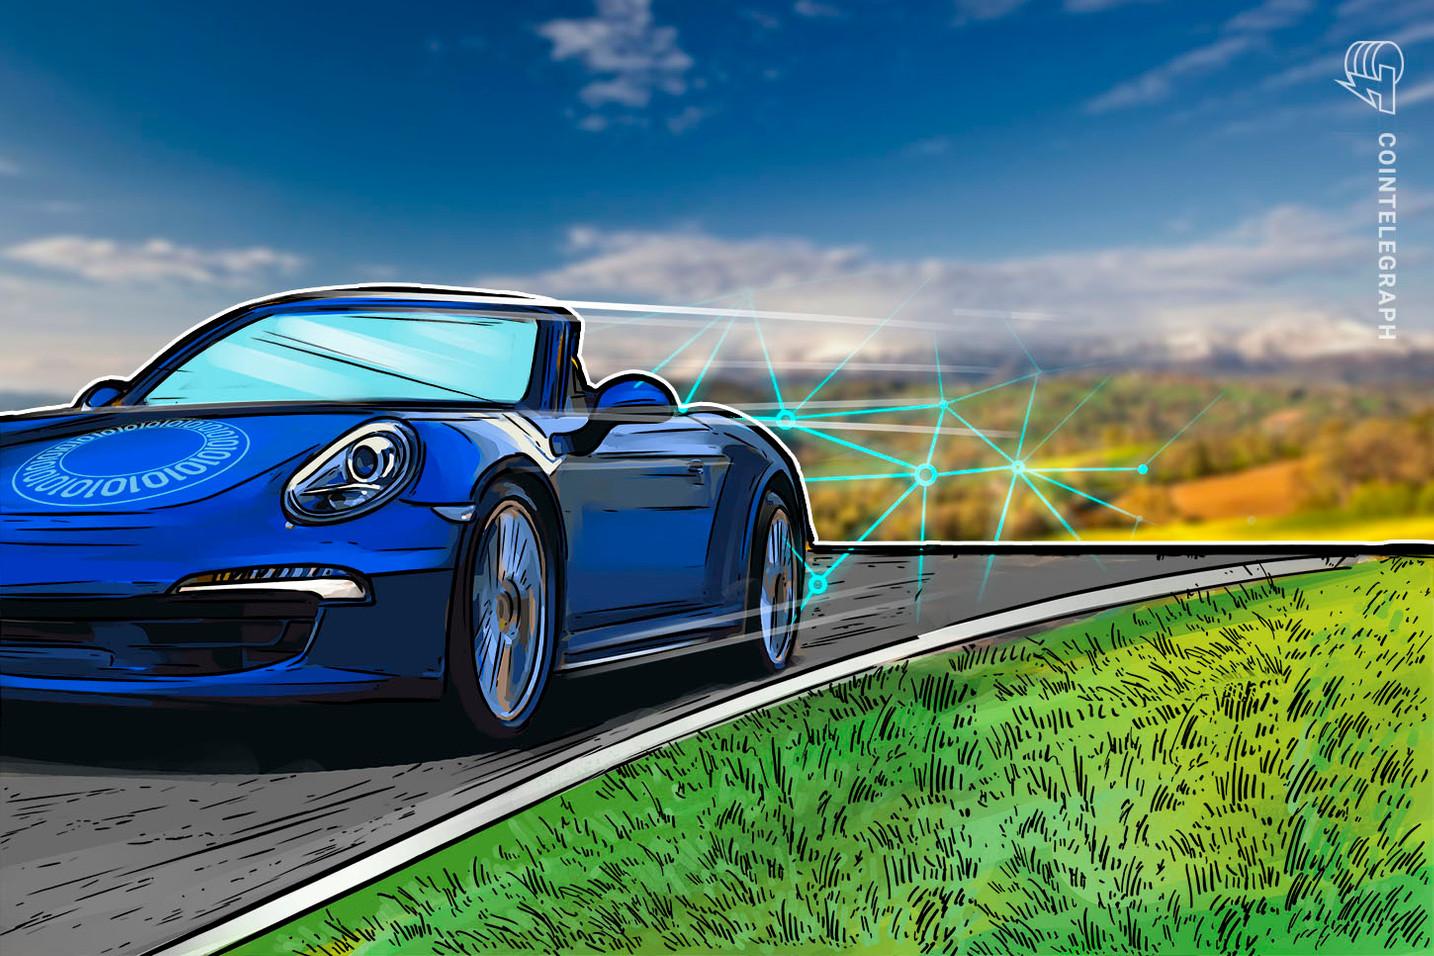 BBVA cierra un préstamo de 150 millones de euros con Porsche Holding utilizando Blockchain